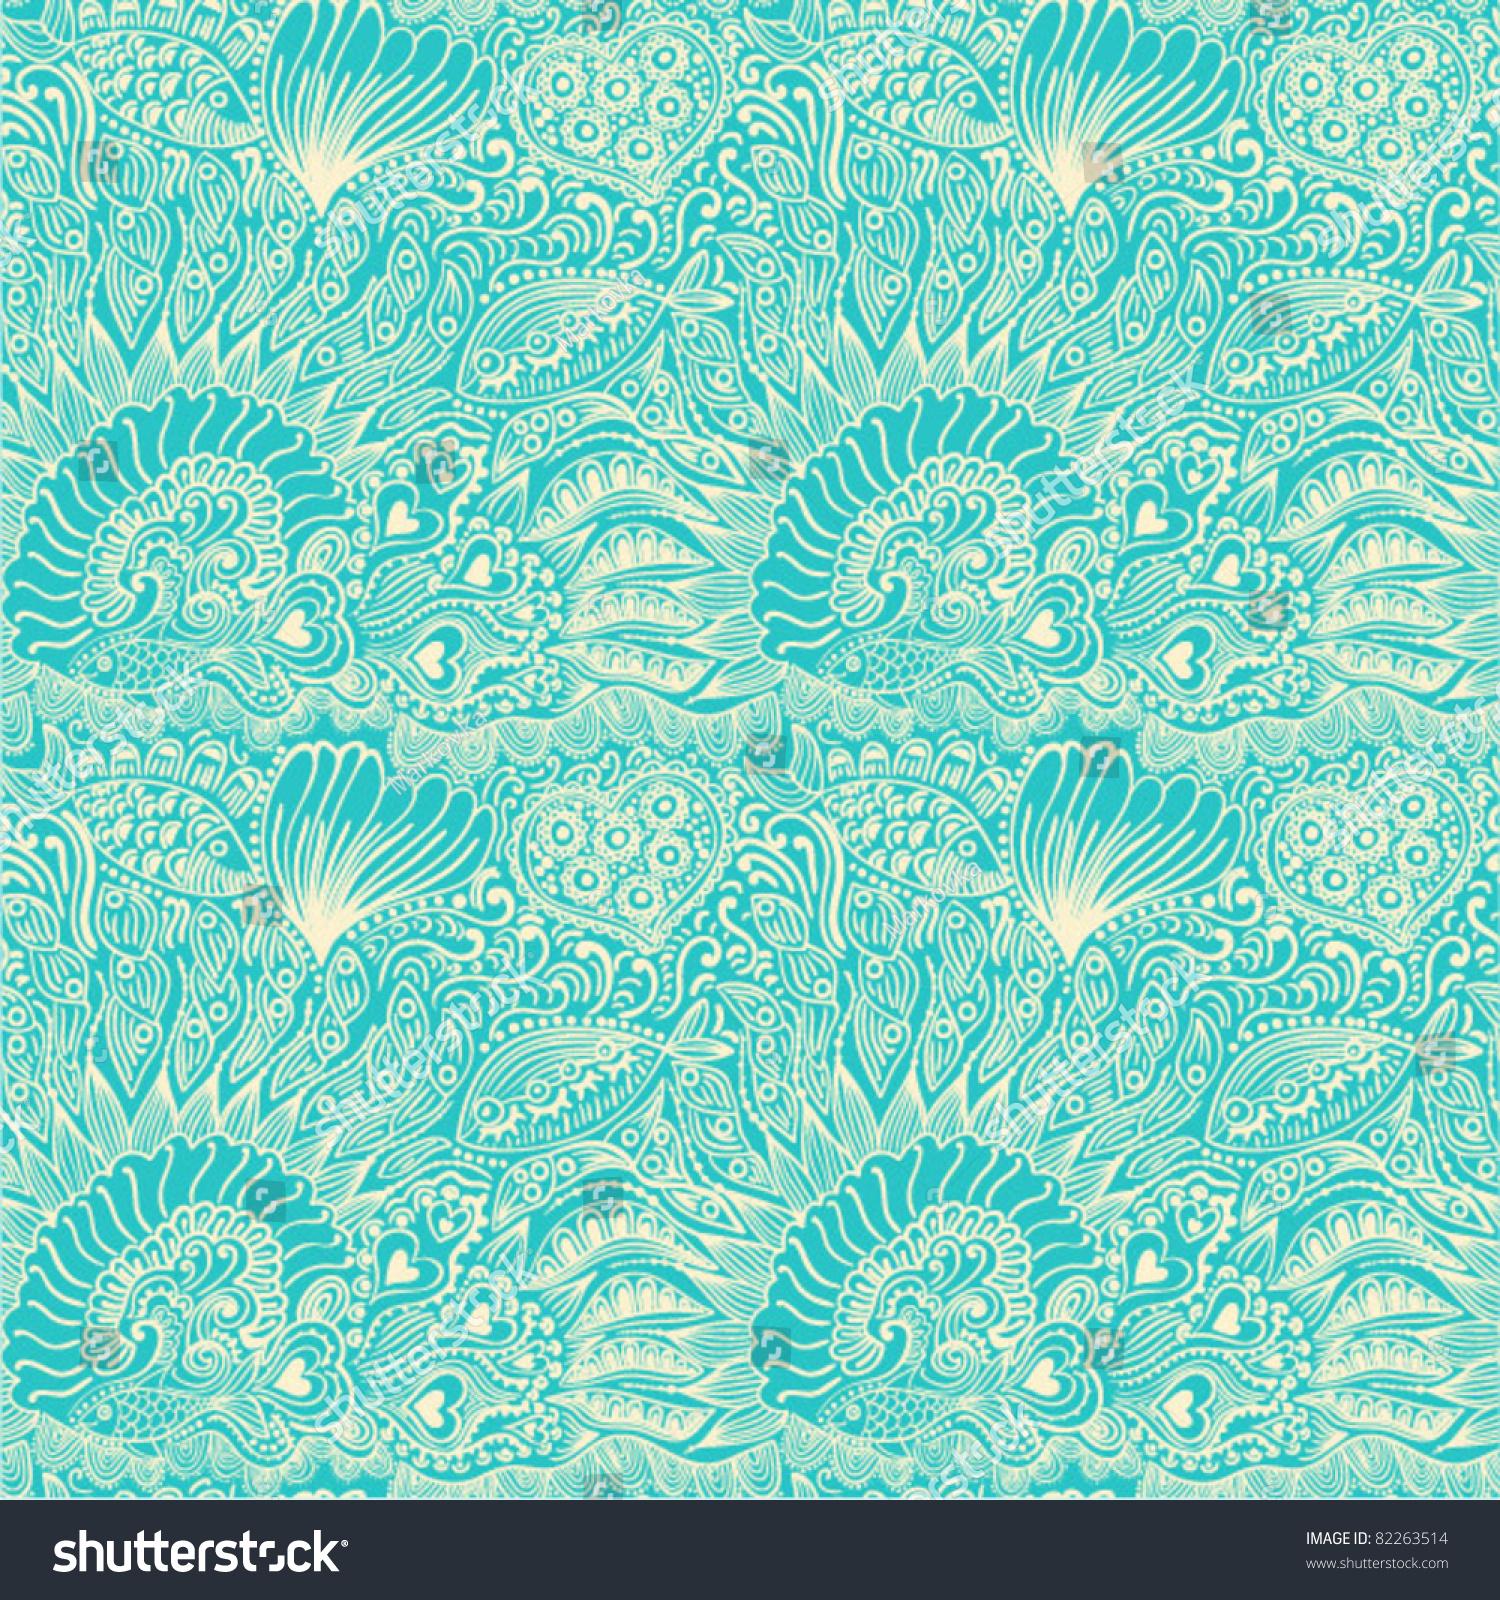 Seamless Underwater Texture abstract seamless pattern underwater life fish stock vector